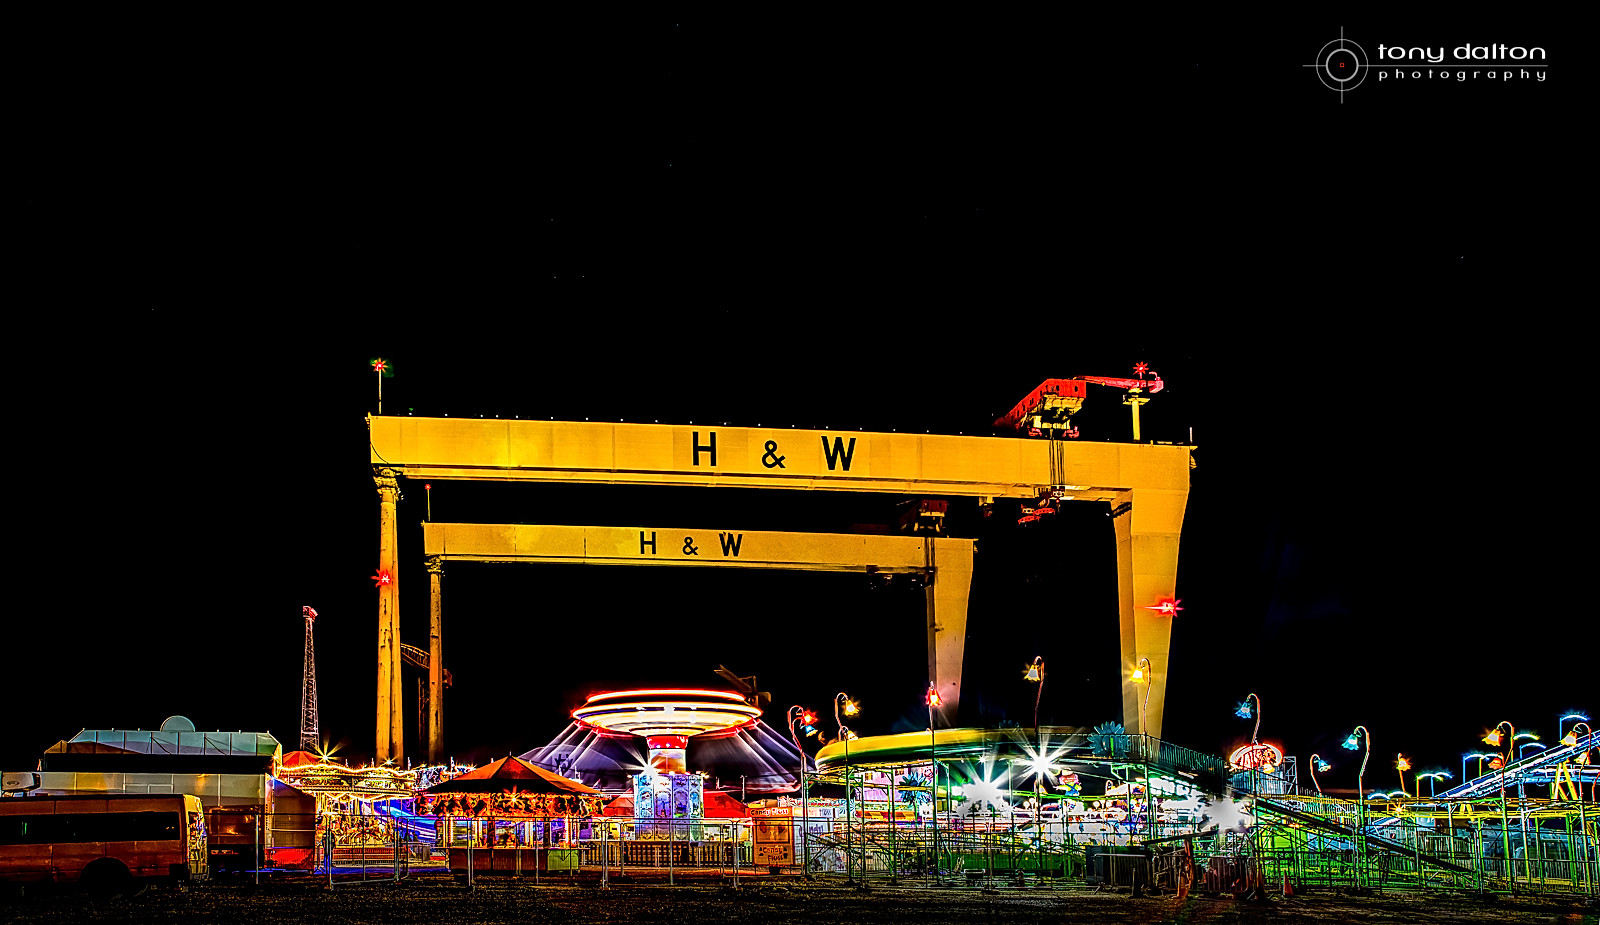 Harland & Wolff Fun Fair